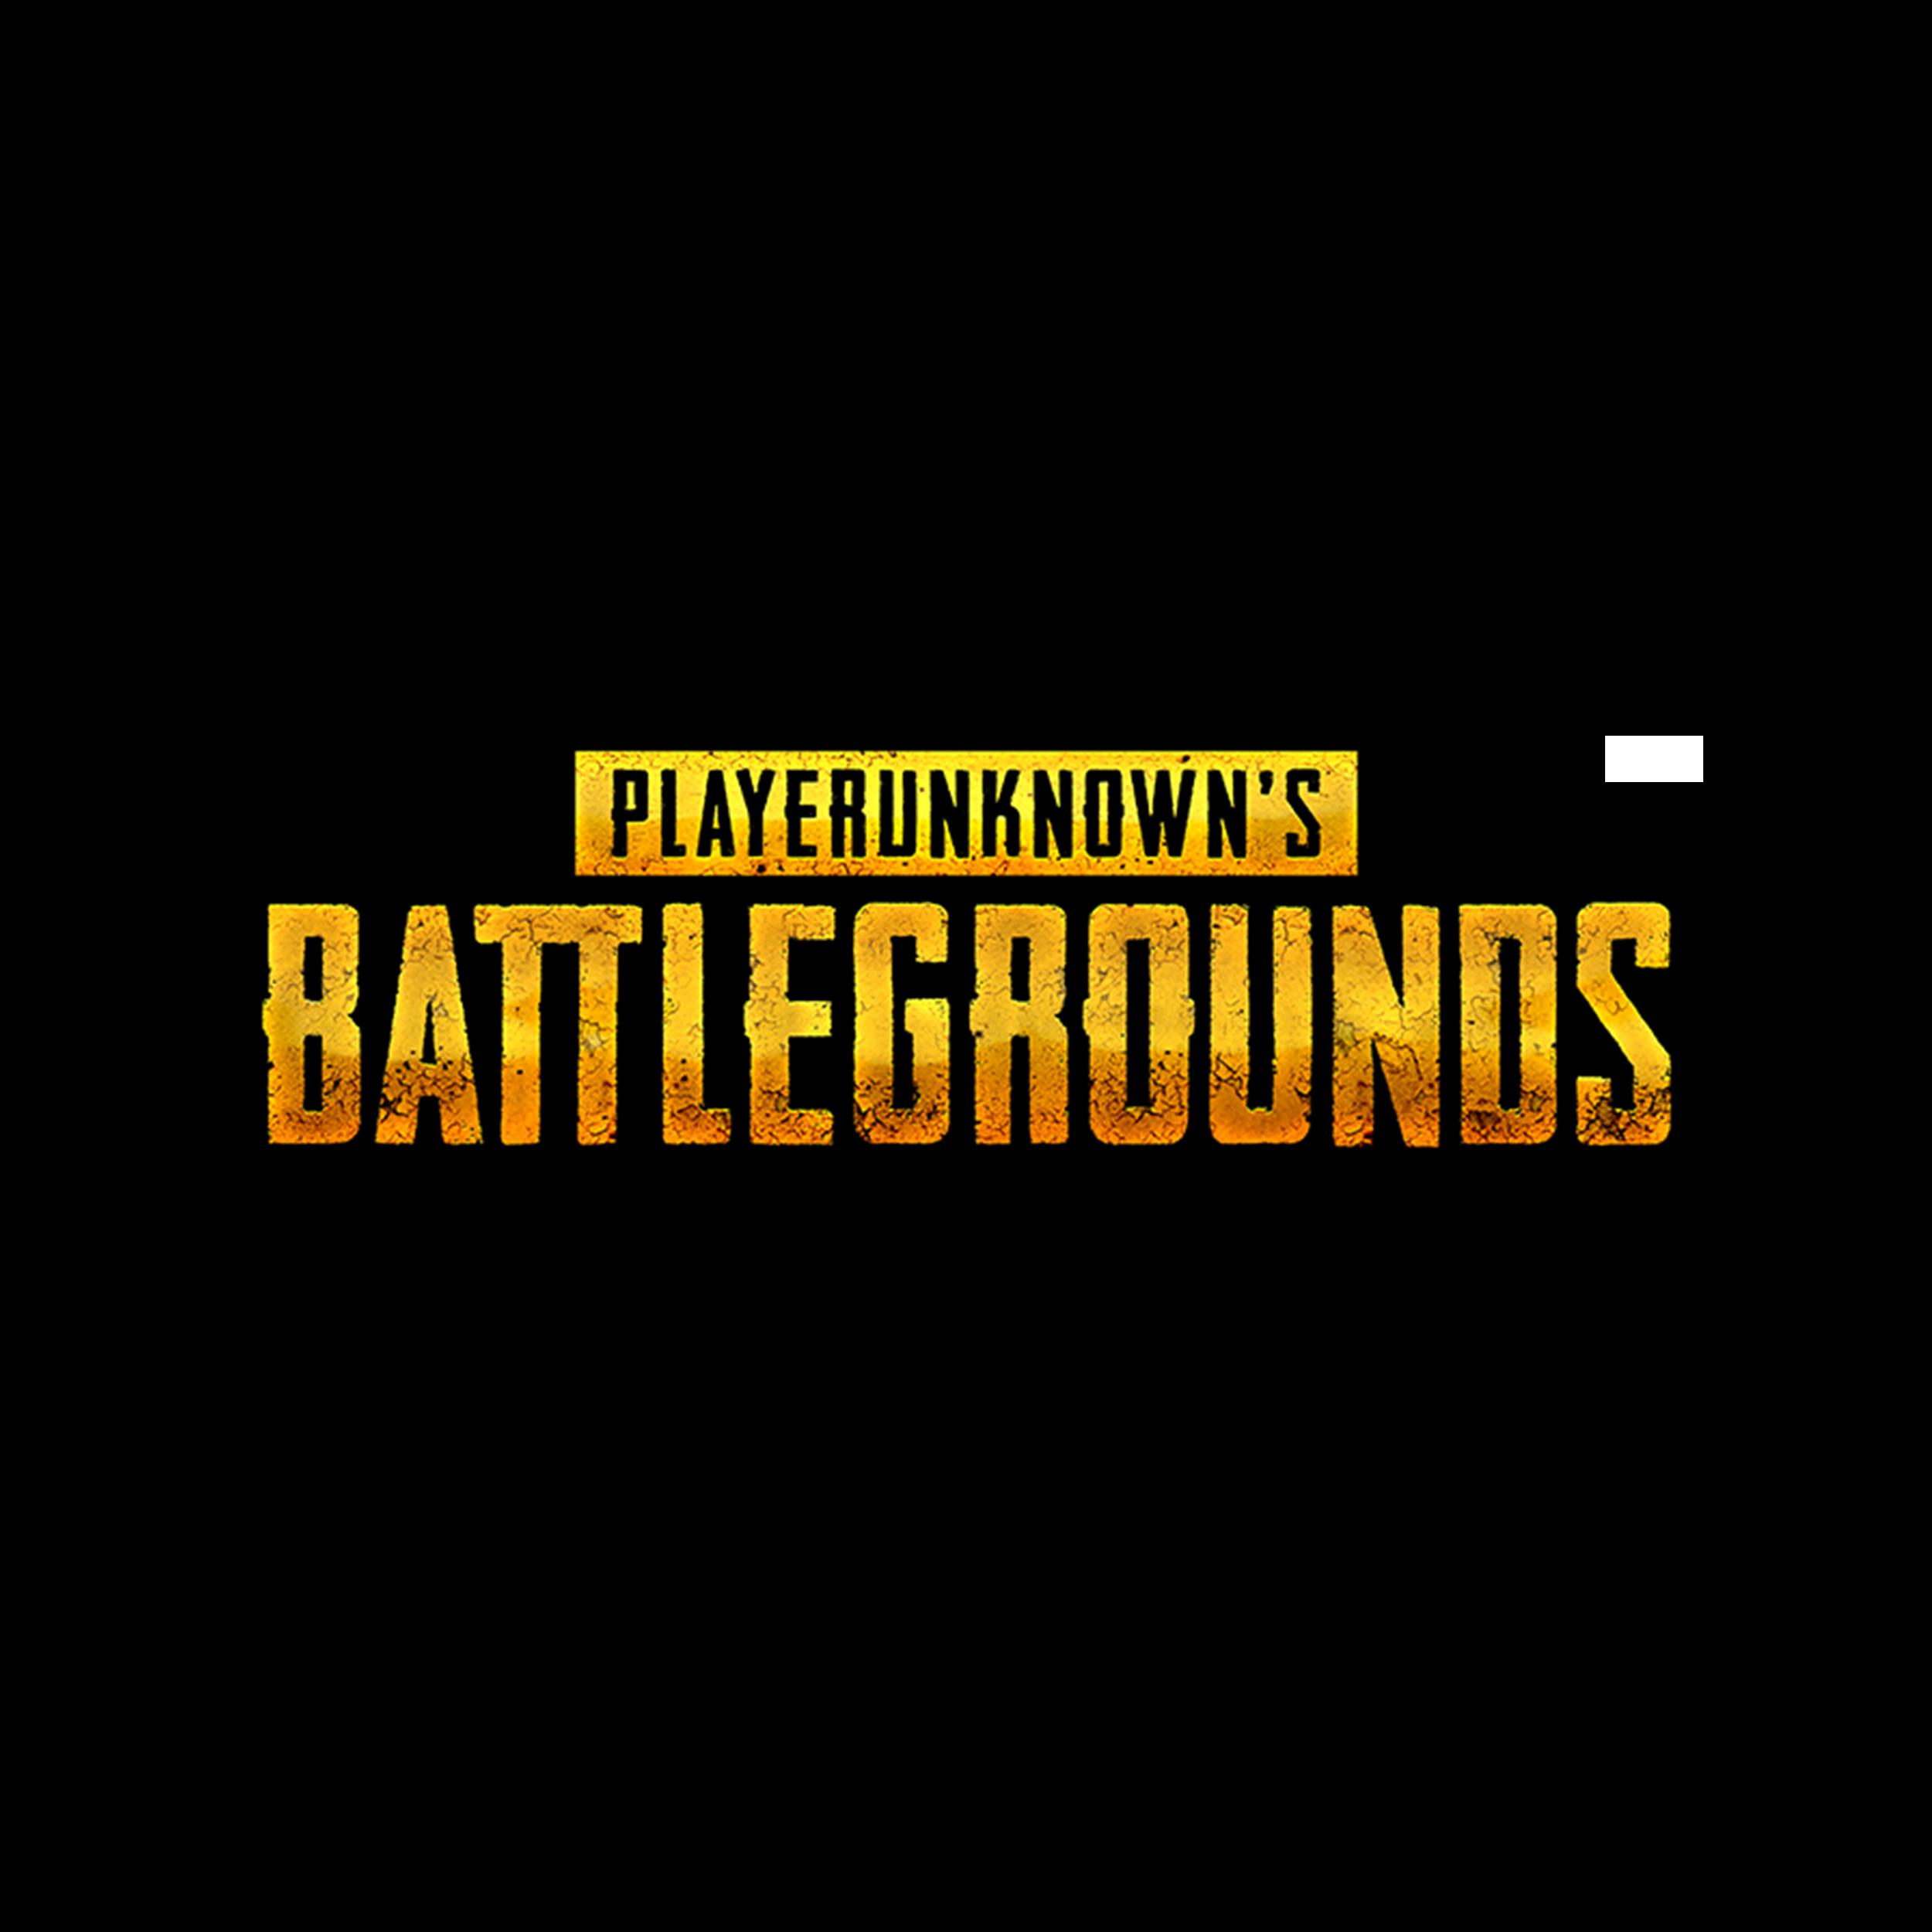 Playerunknown's Battlegrounds logo